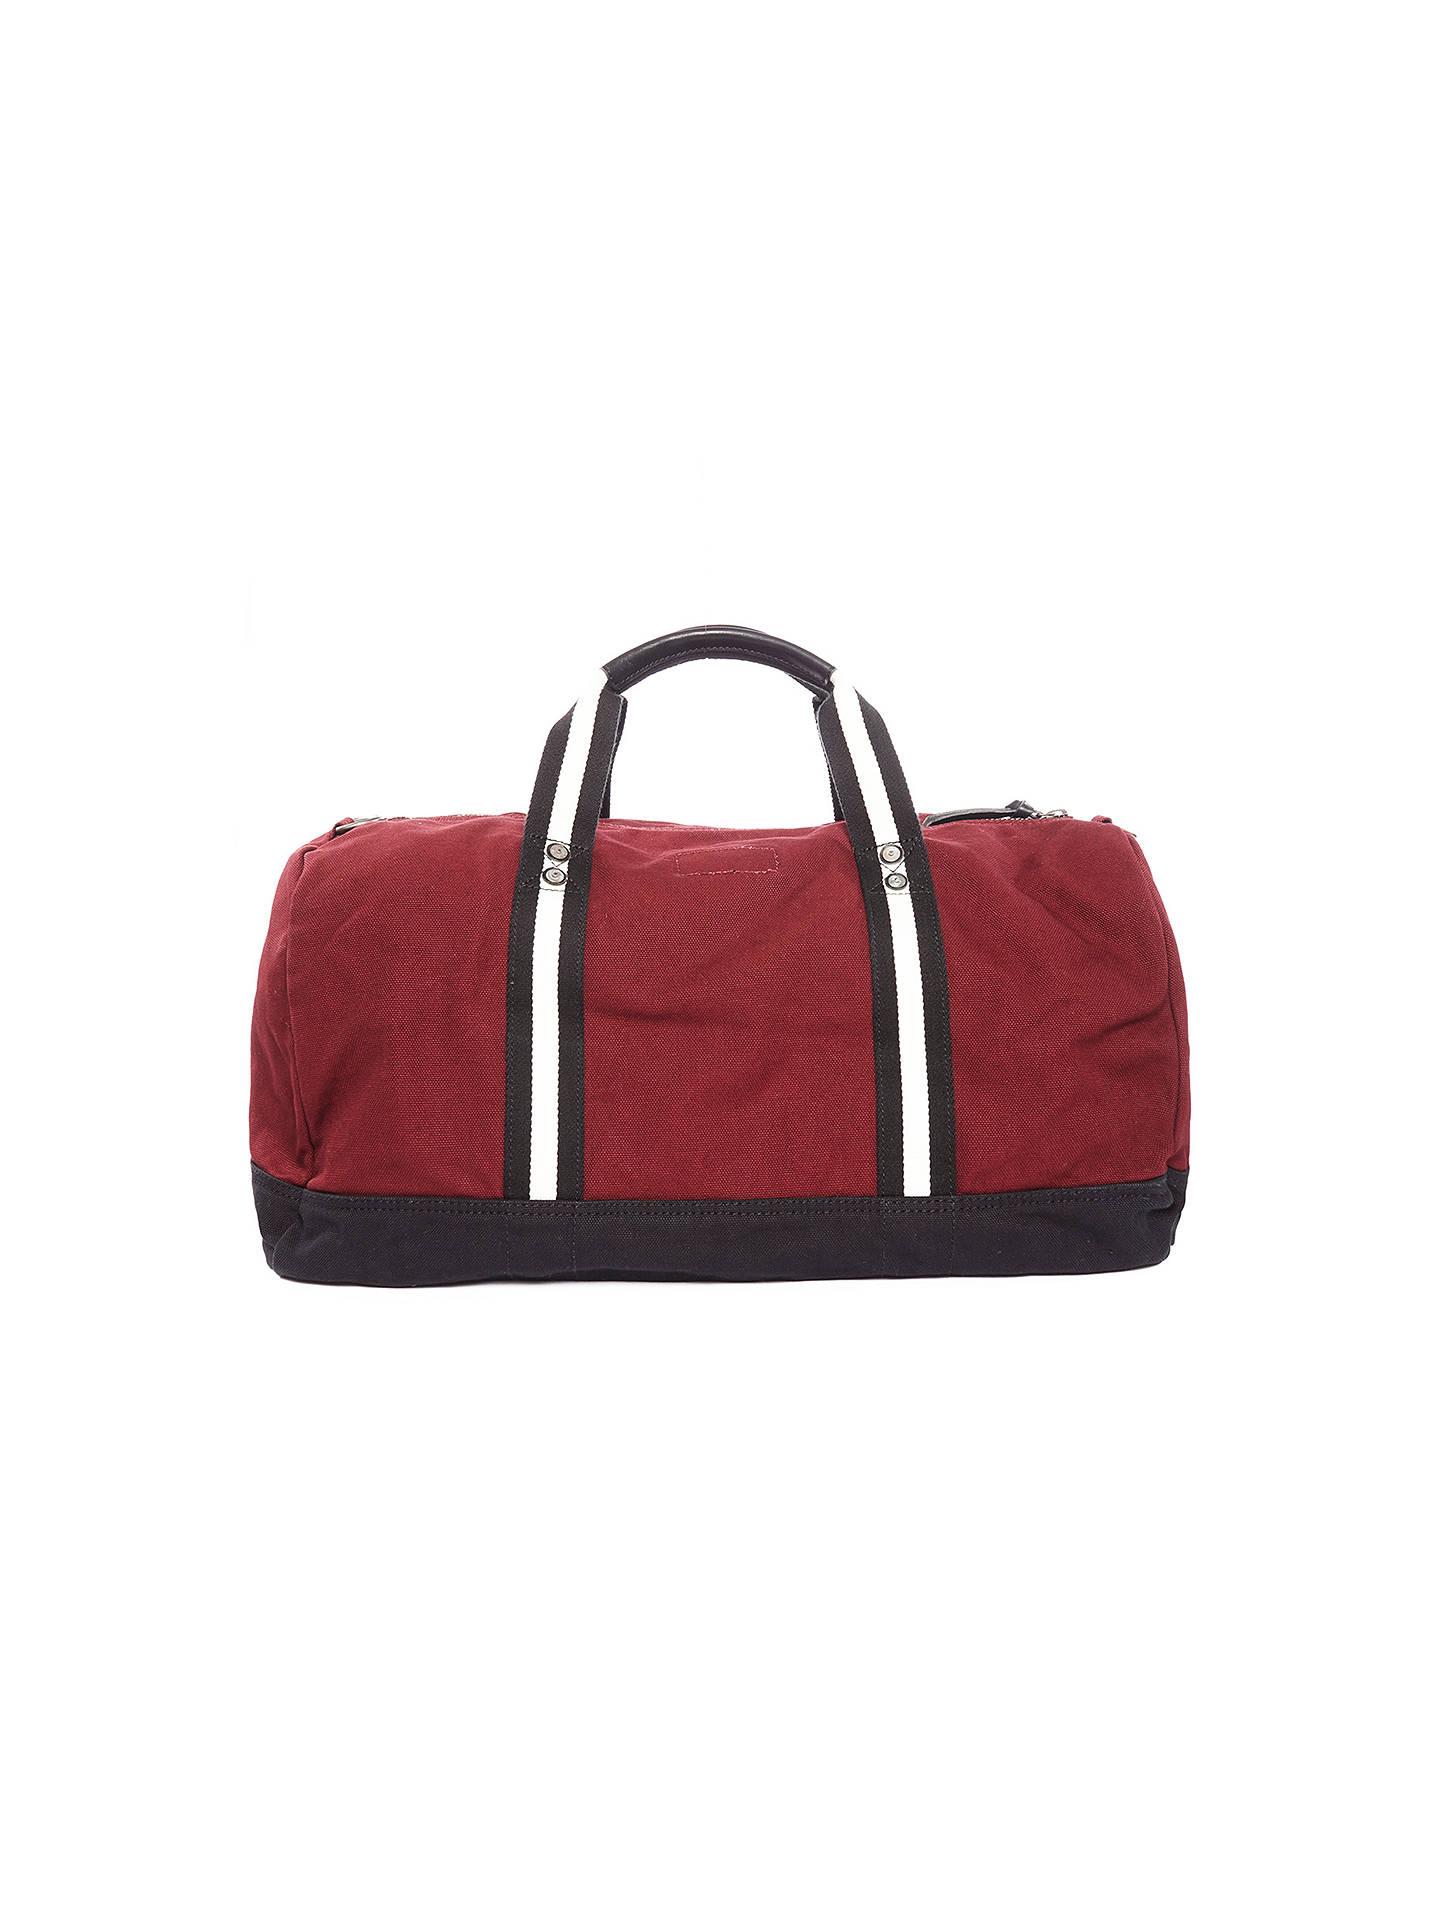 5e4c689d87 ... Buy Polo Ralph Lauren Canvas Duffle Bag